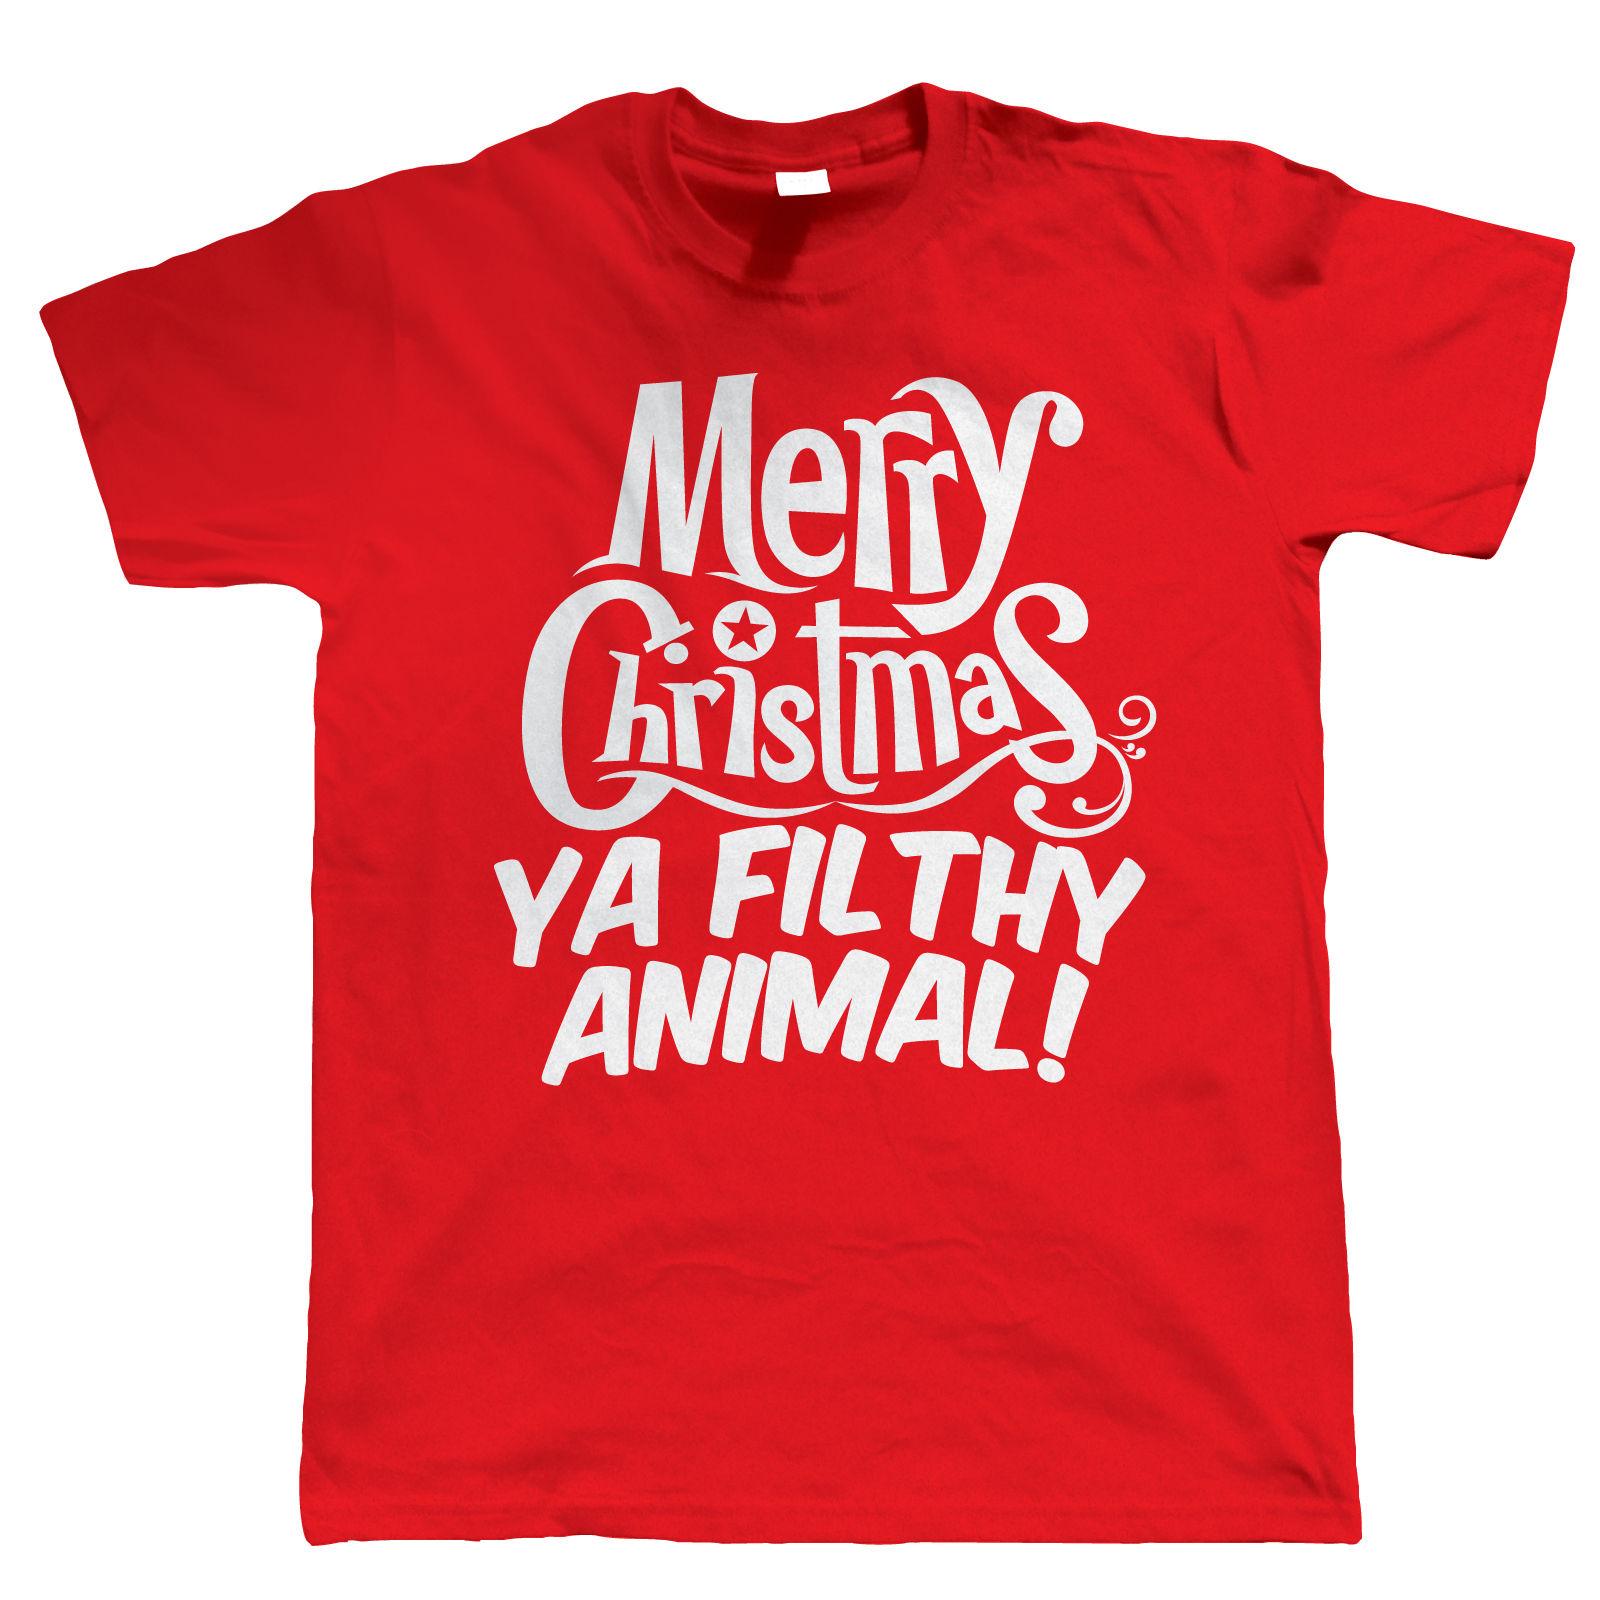 Merry Christmas Ya Filthy Animal Funny T Shirt Gift Secret